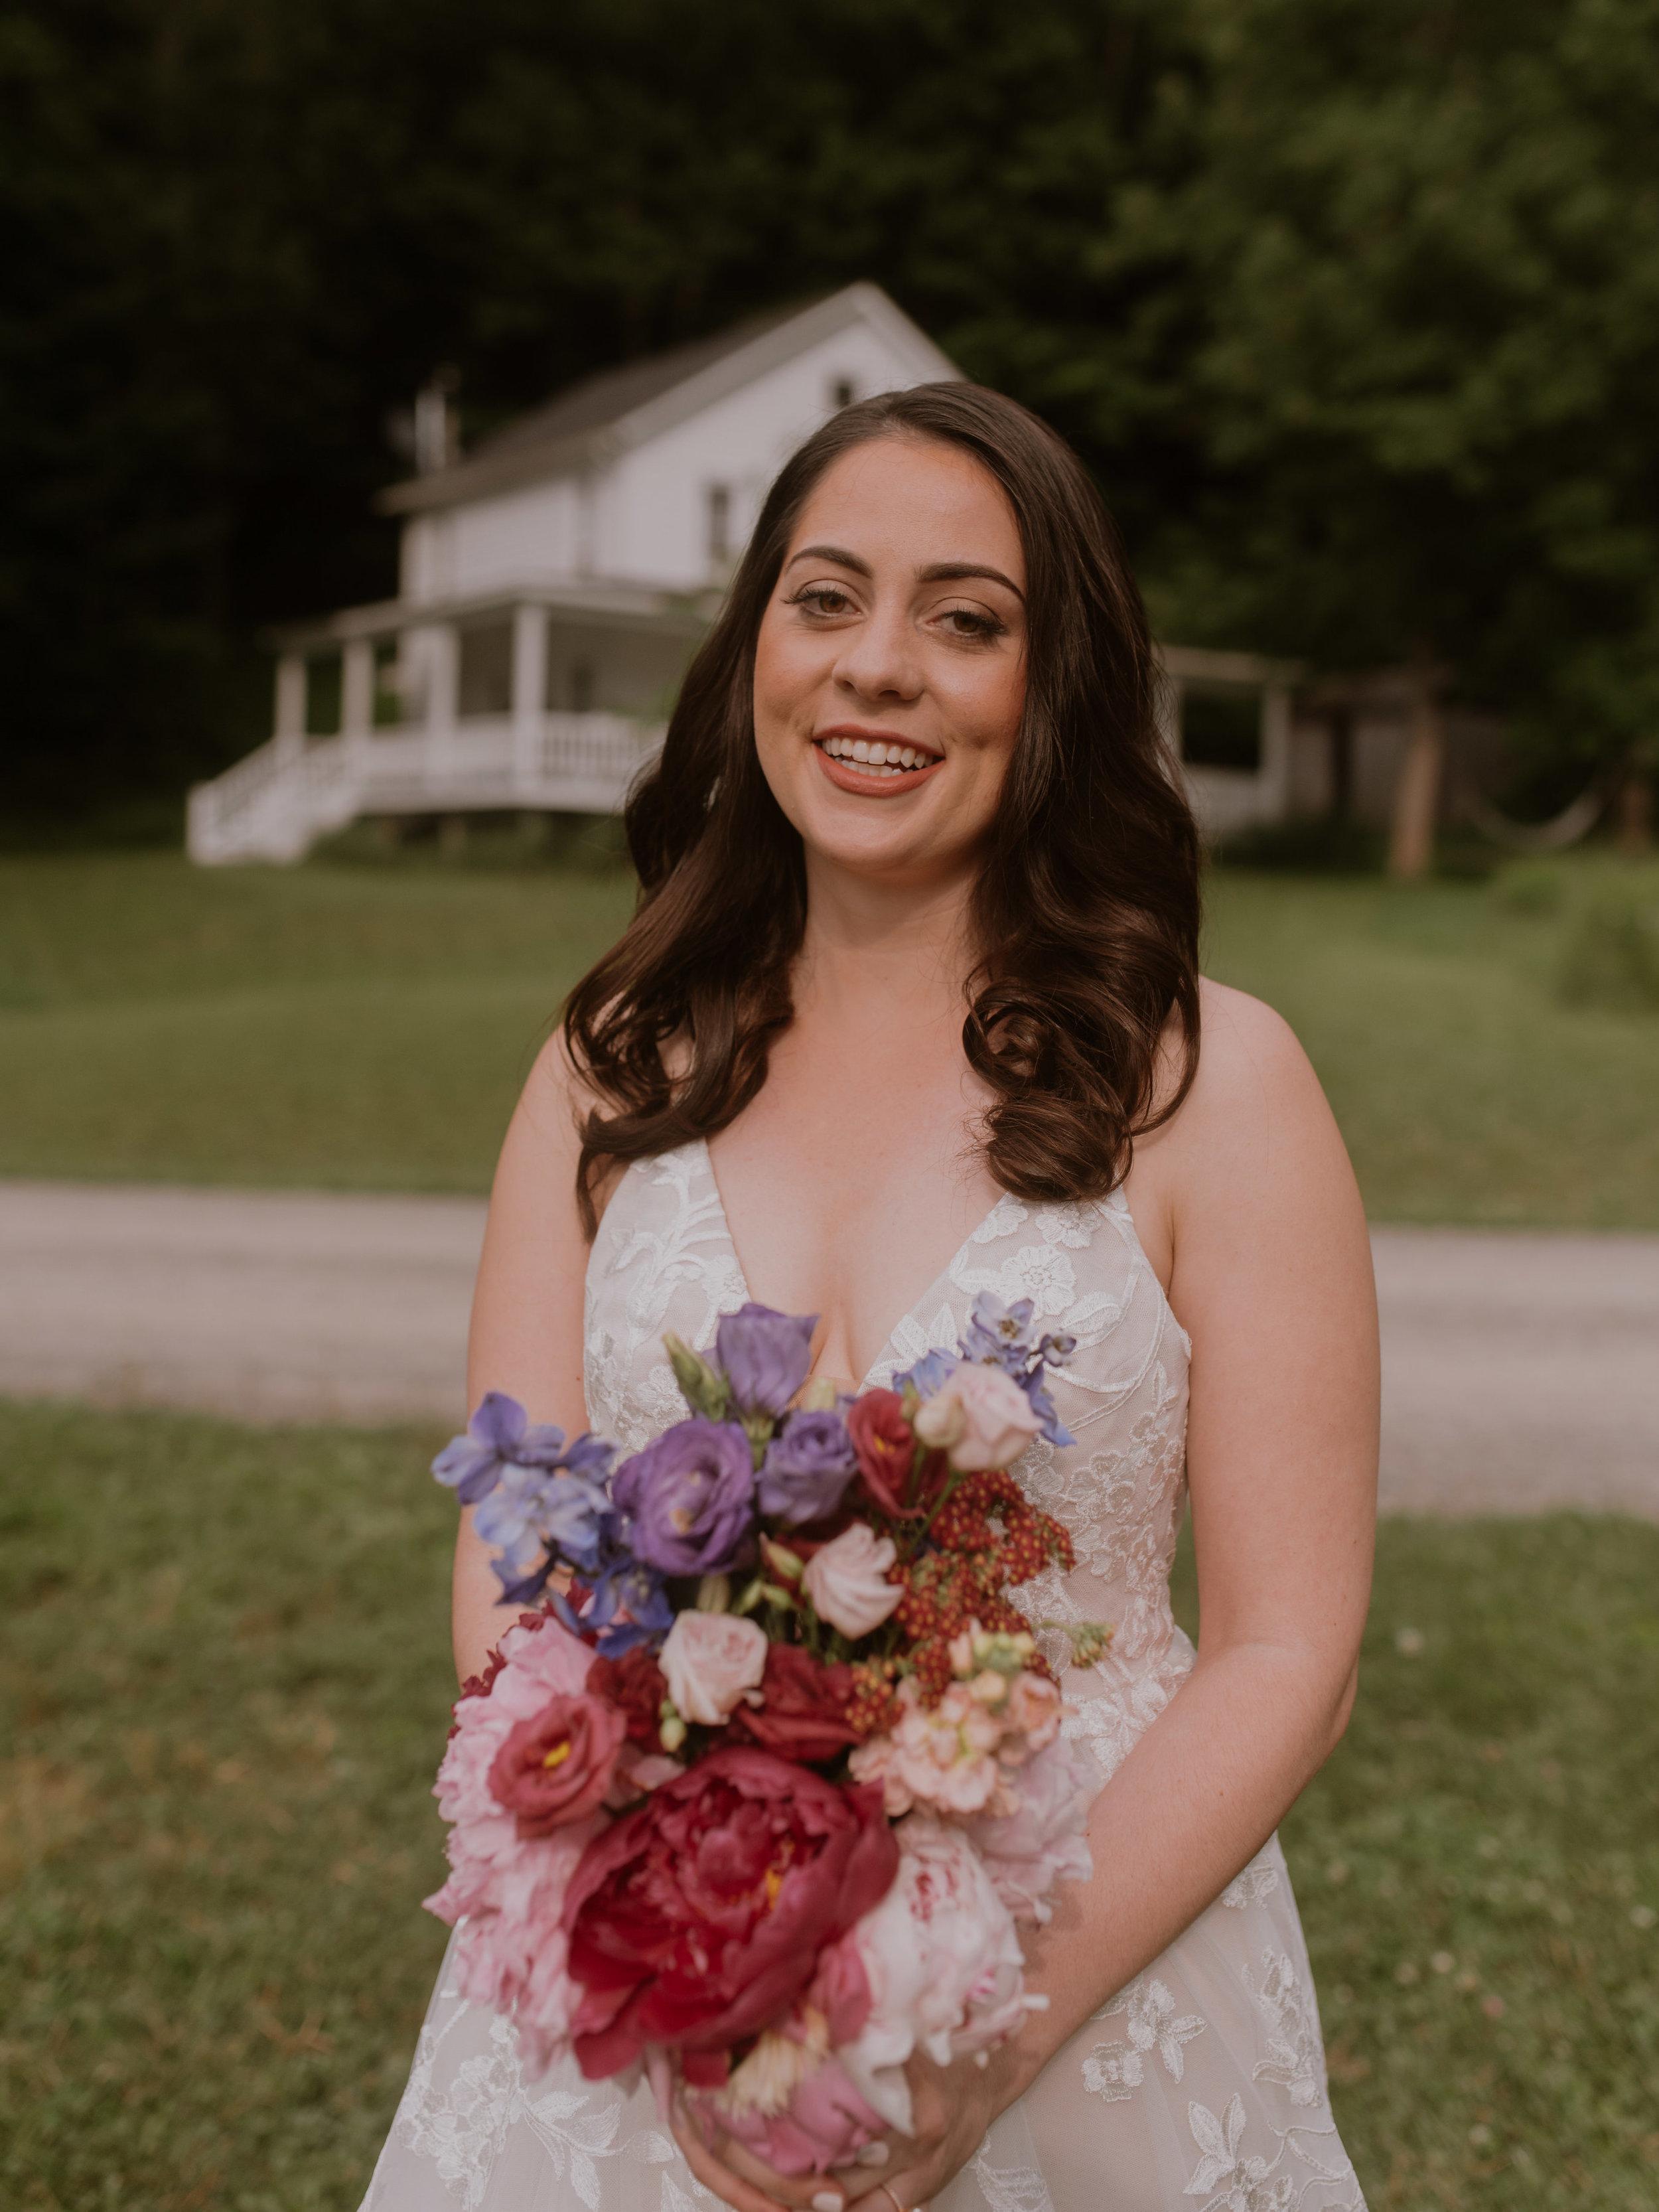 Cassandra-Anu-Wedding-Upstate-Catskills-Summer-Meadowlark-Stills-Lawrence-Braun-FINAL-0307.jpg